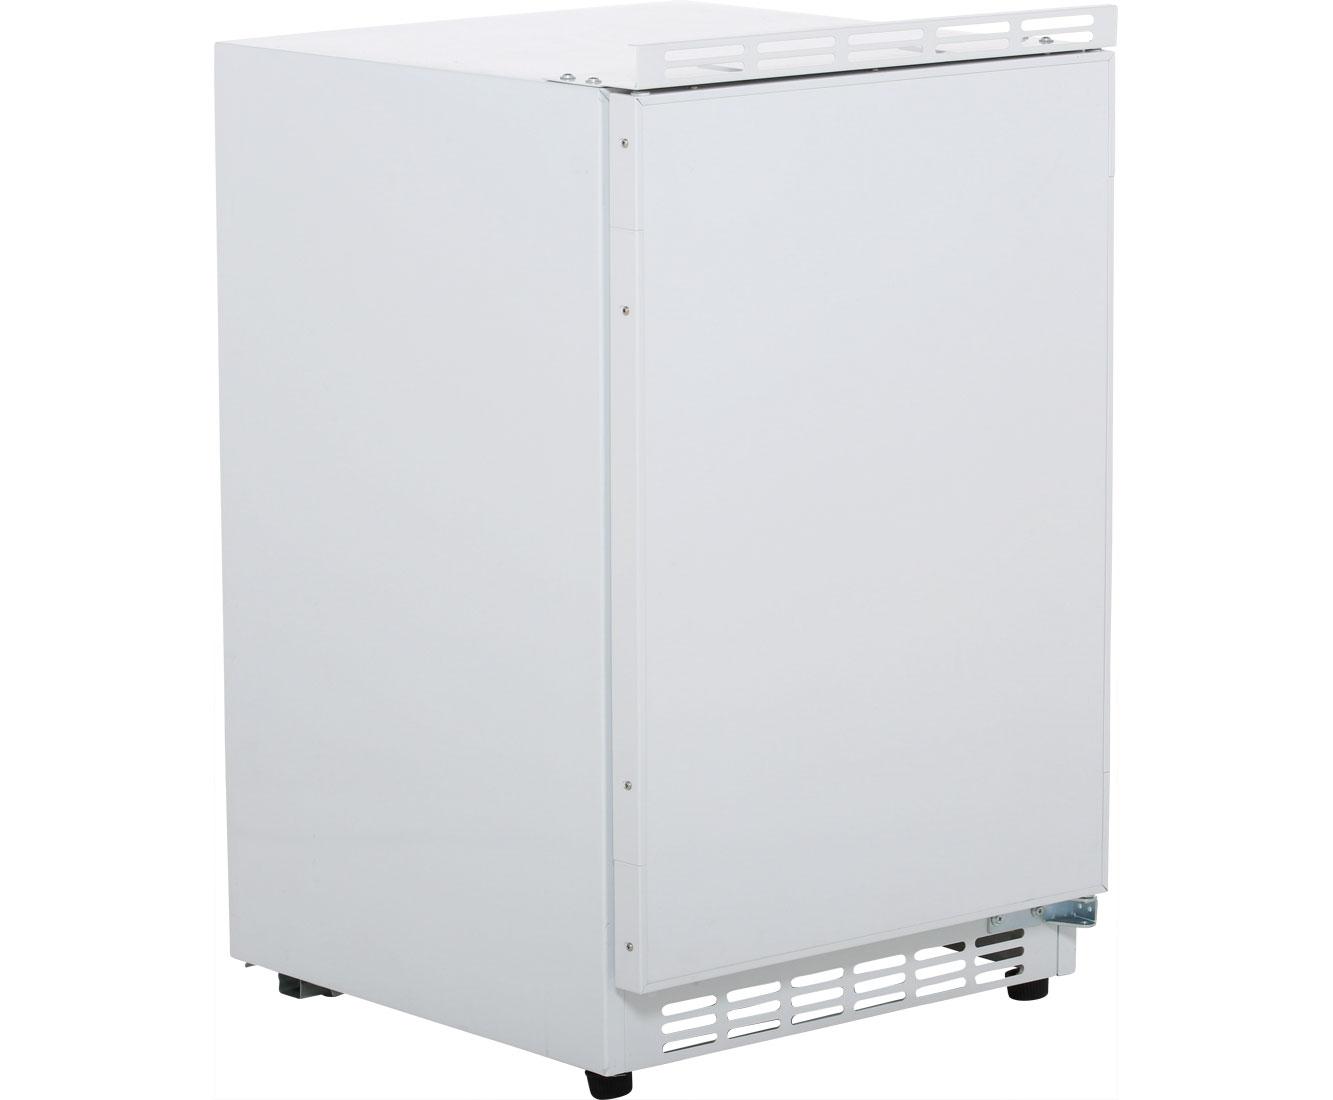 Kühlschrank Unterbau : Kühlschrank unterbau liebherr integrierbarer unterbau